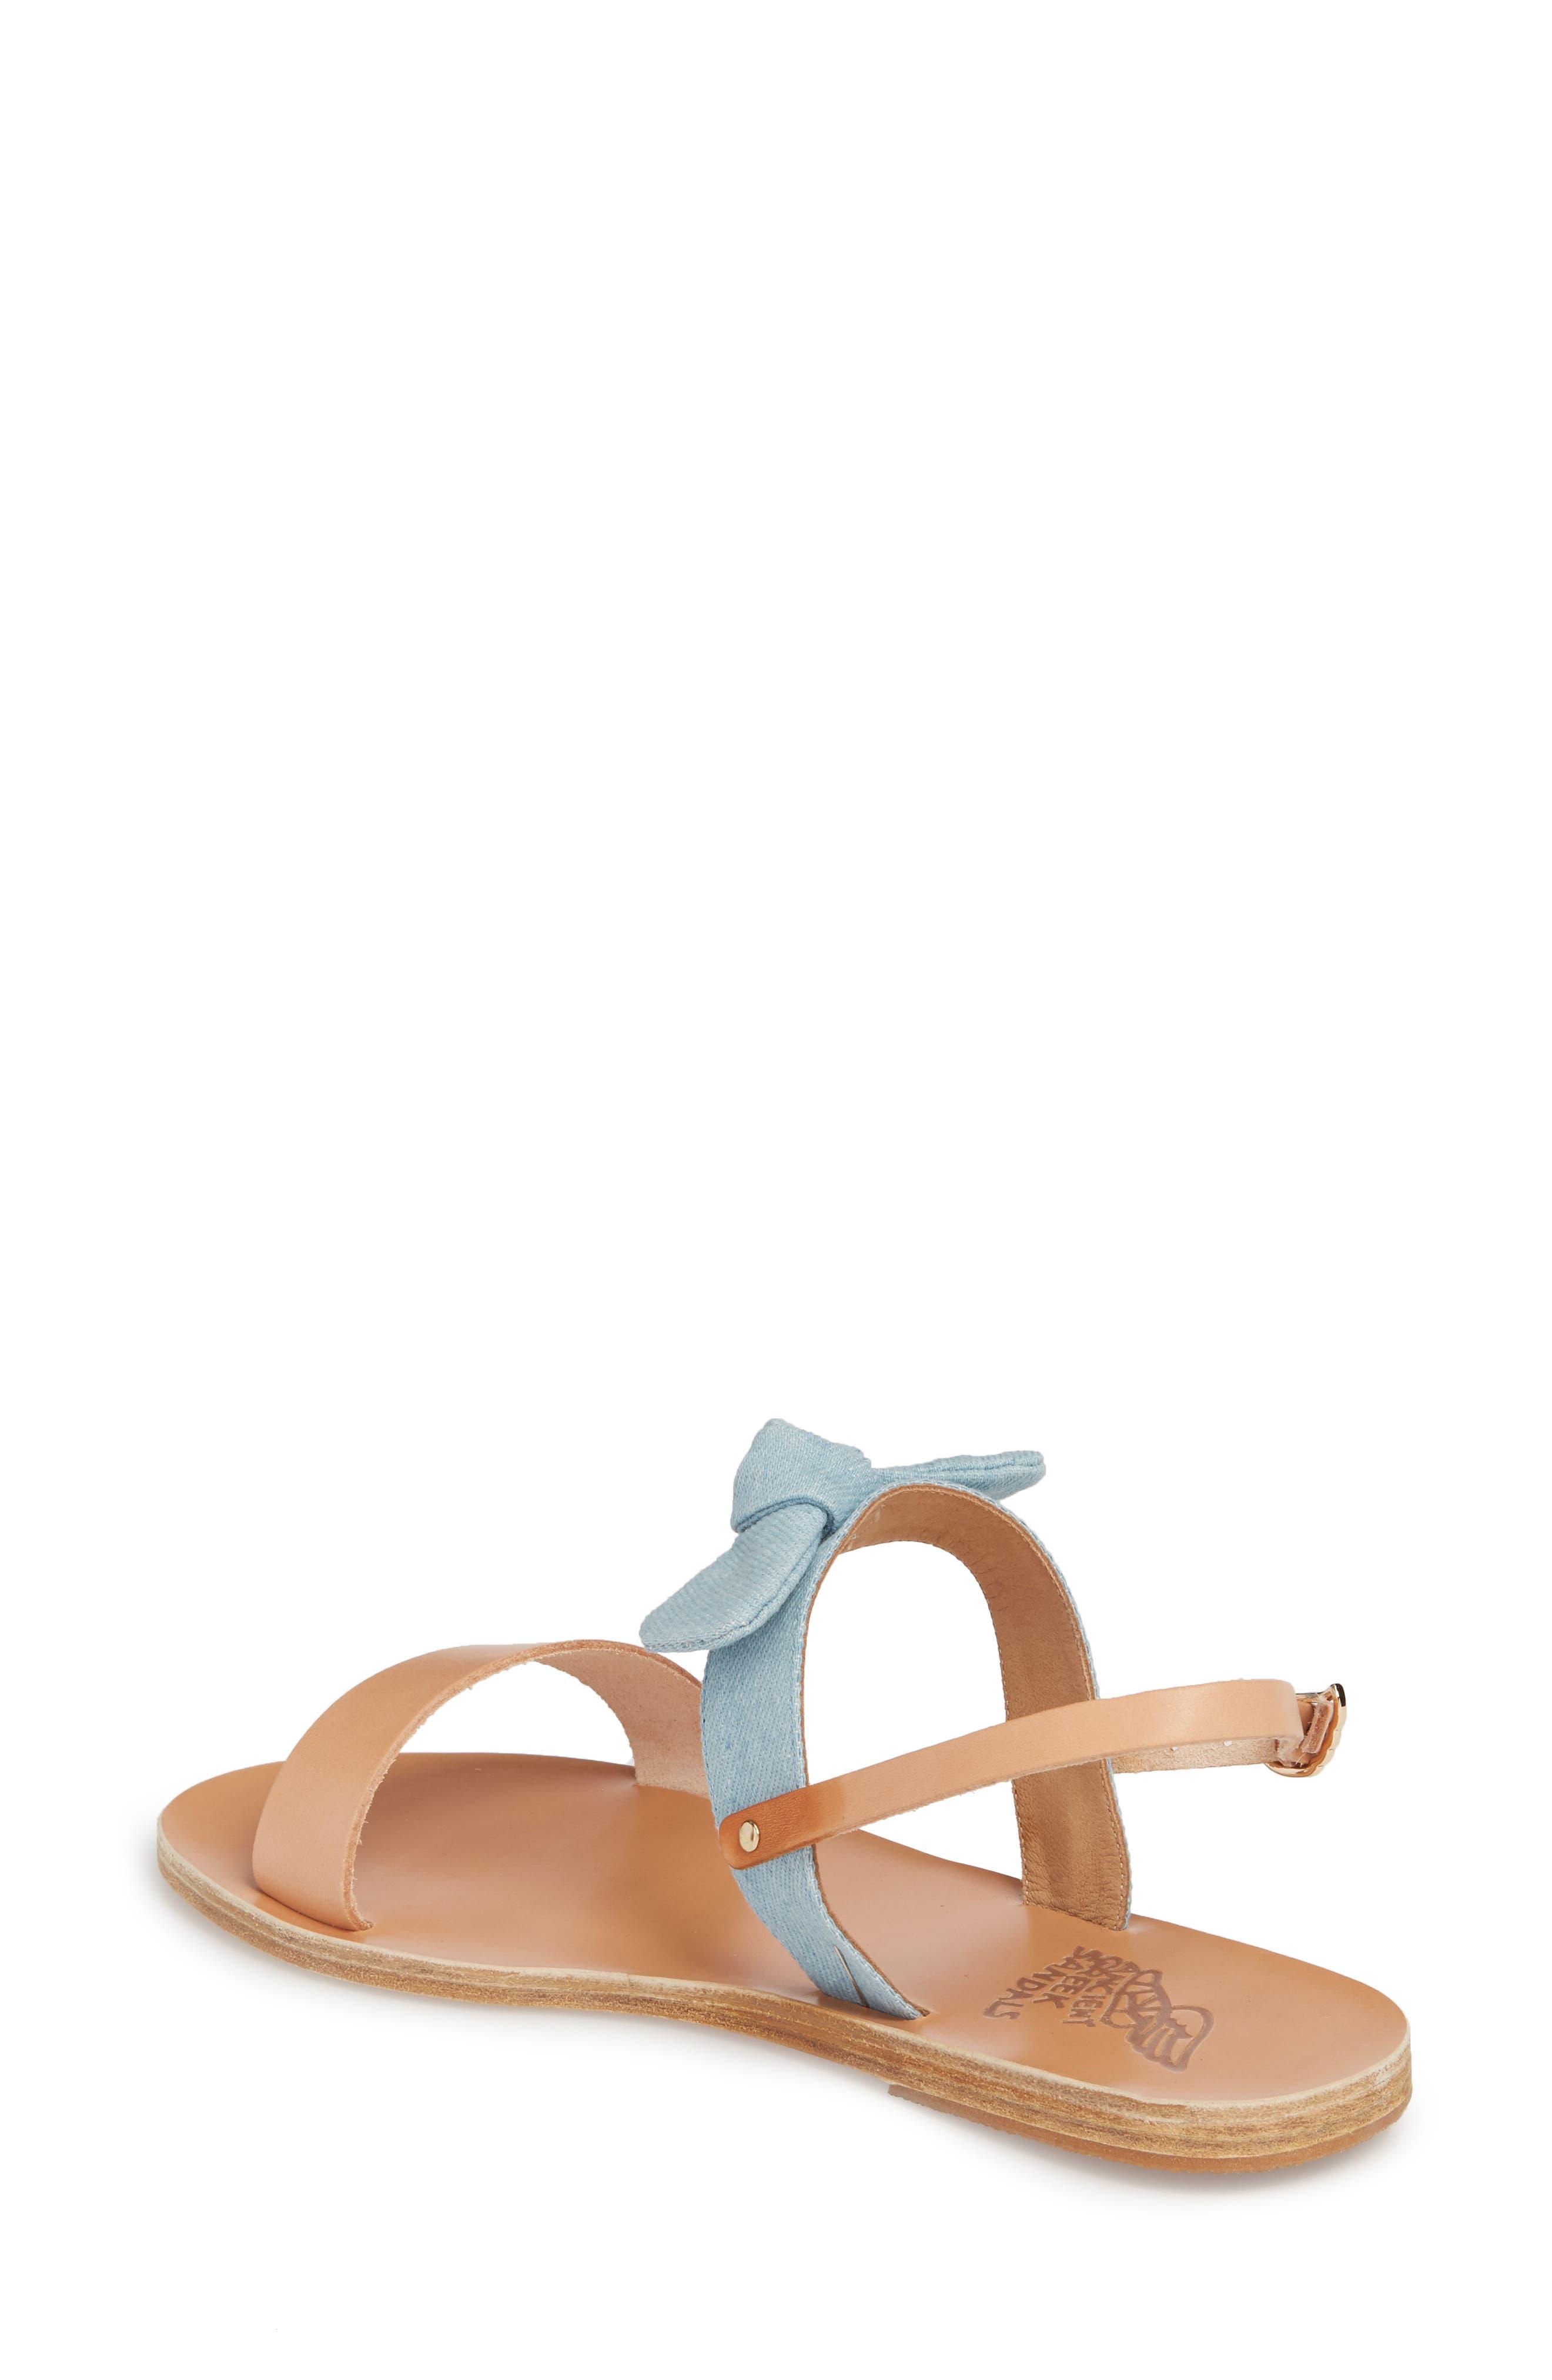 Clio Bow Sandal,                             Alternate thumbnail 2, color,